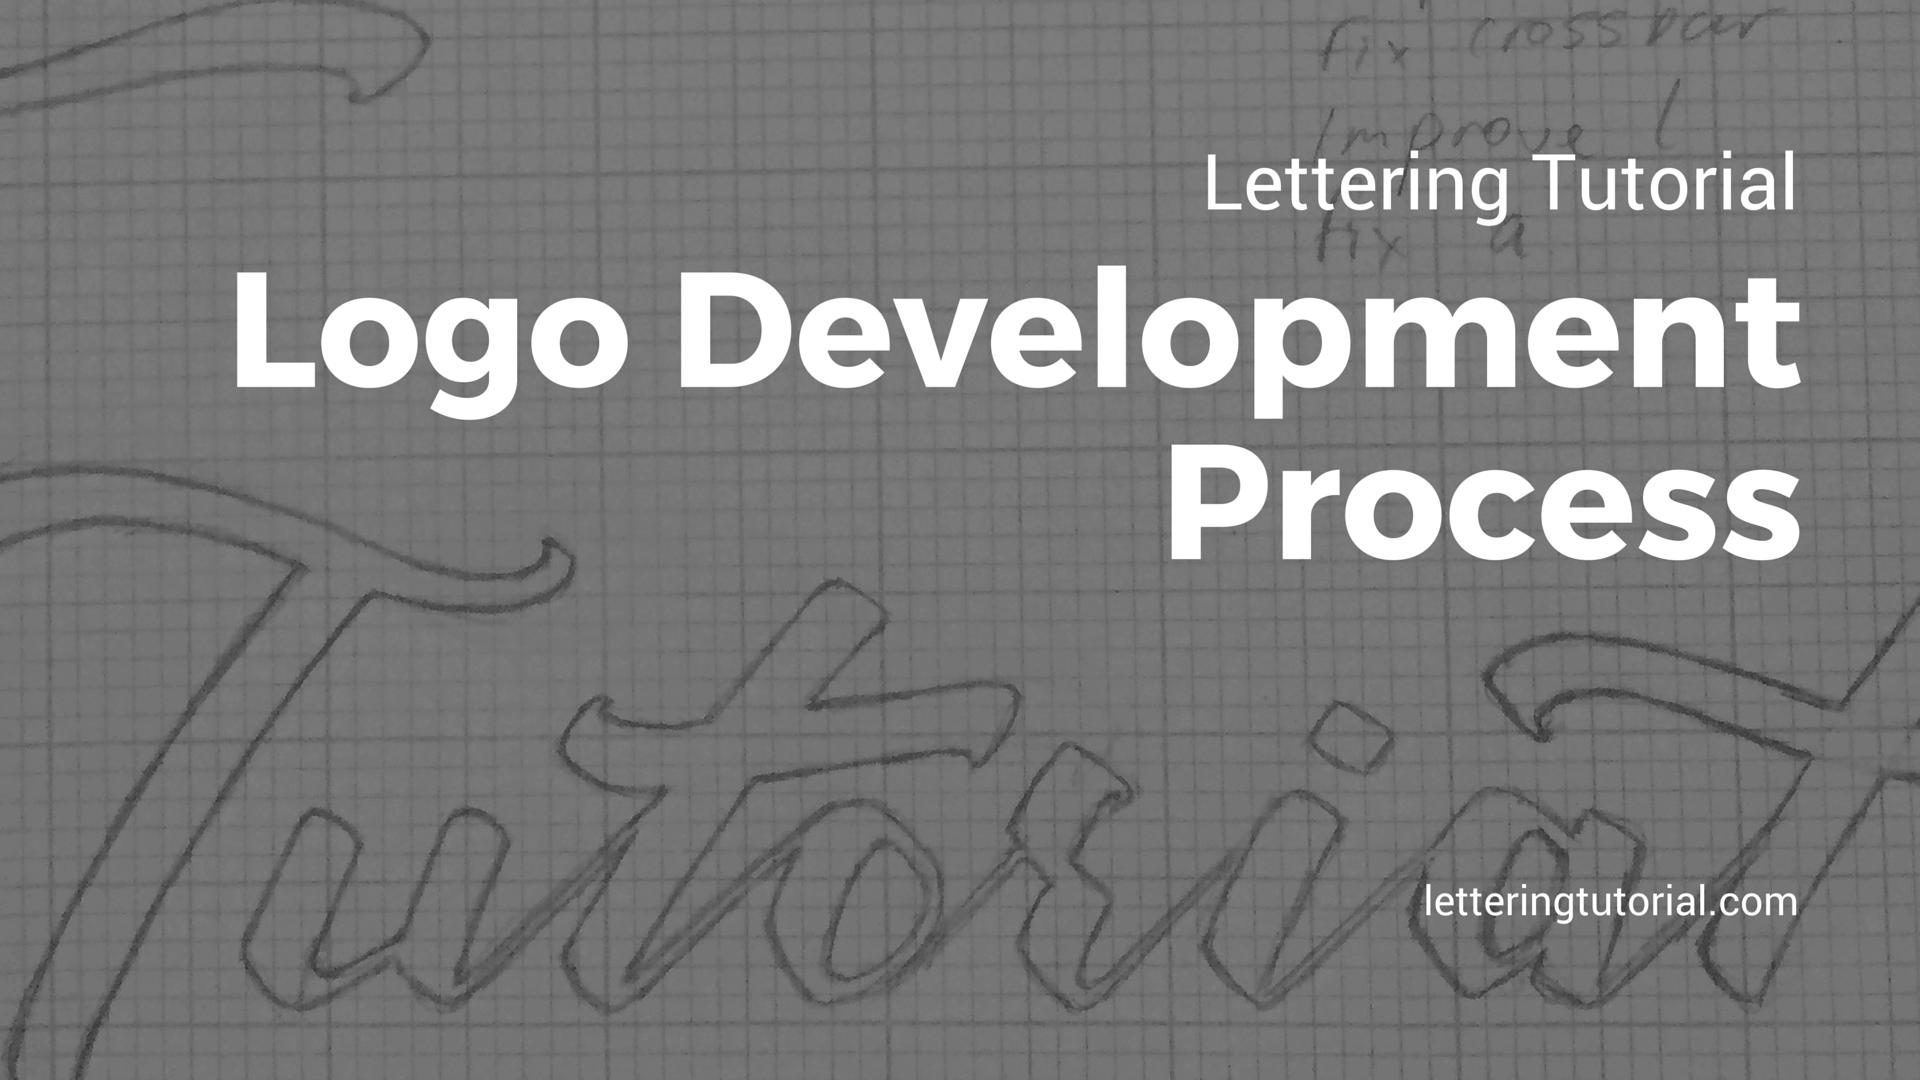 Lettering Tutorial Logo Development Process